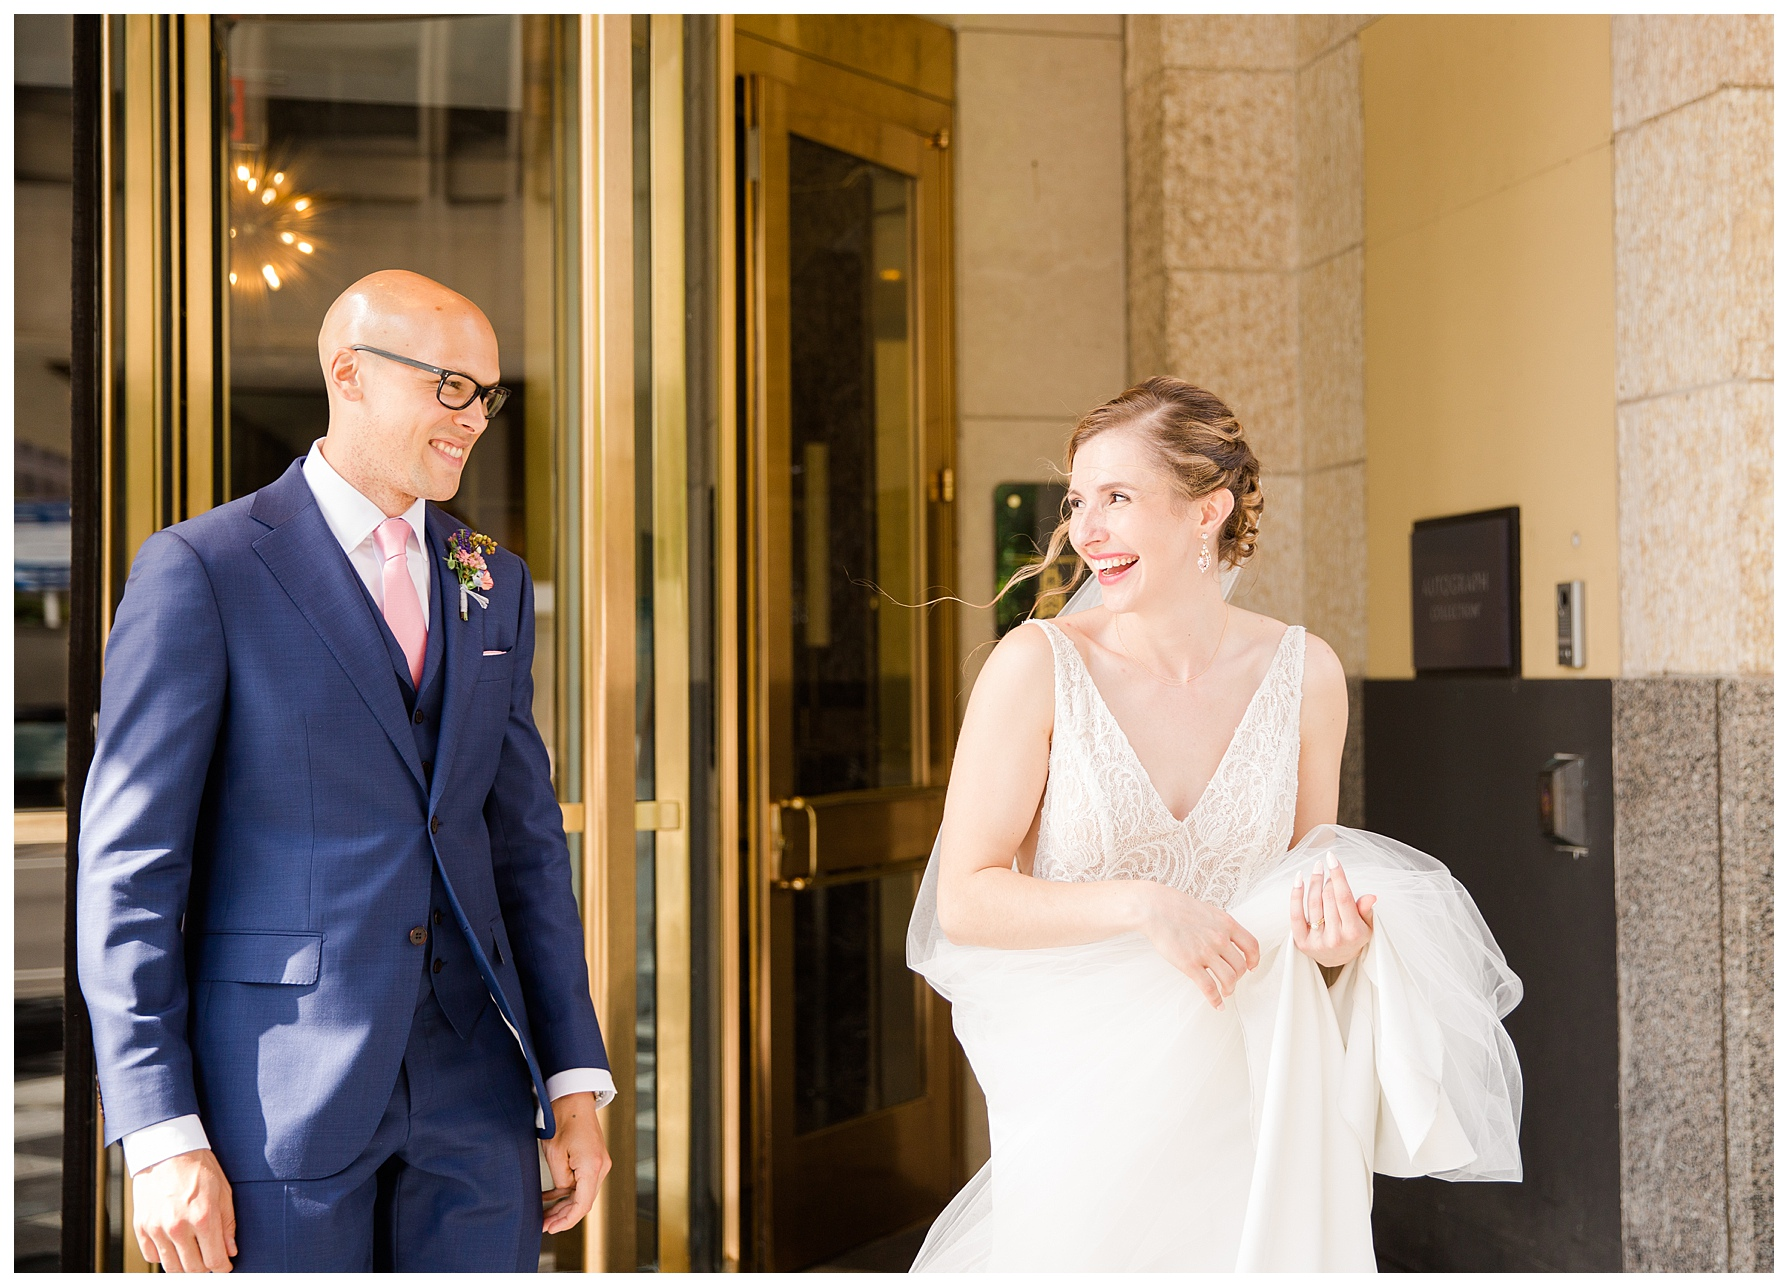 hotel-LeVeque-autograph-collection-columbus-wedding_0028-1.jpg